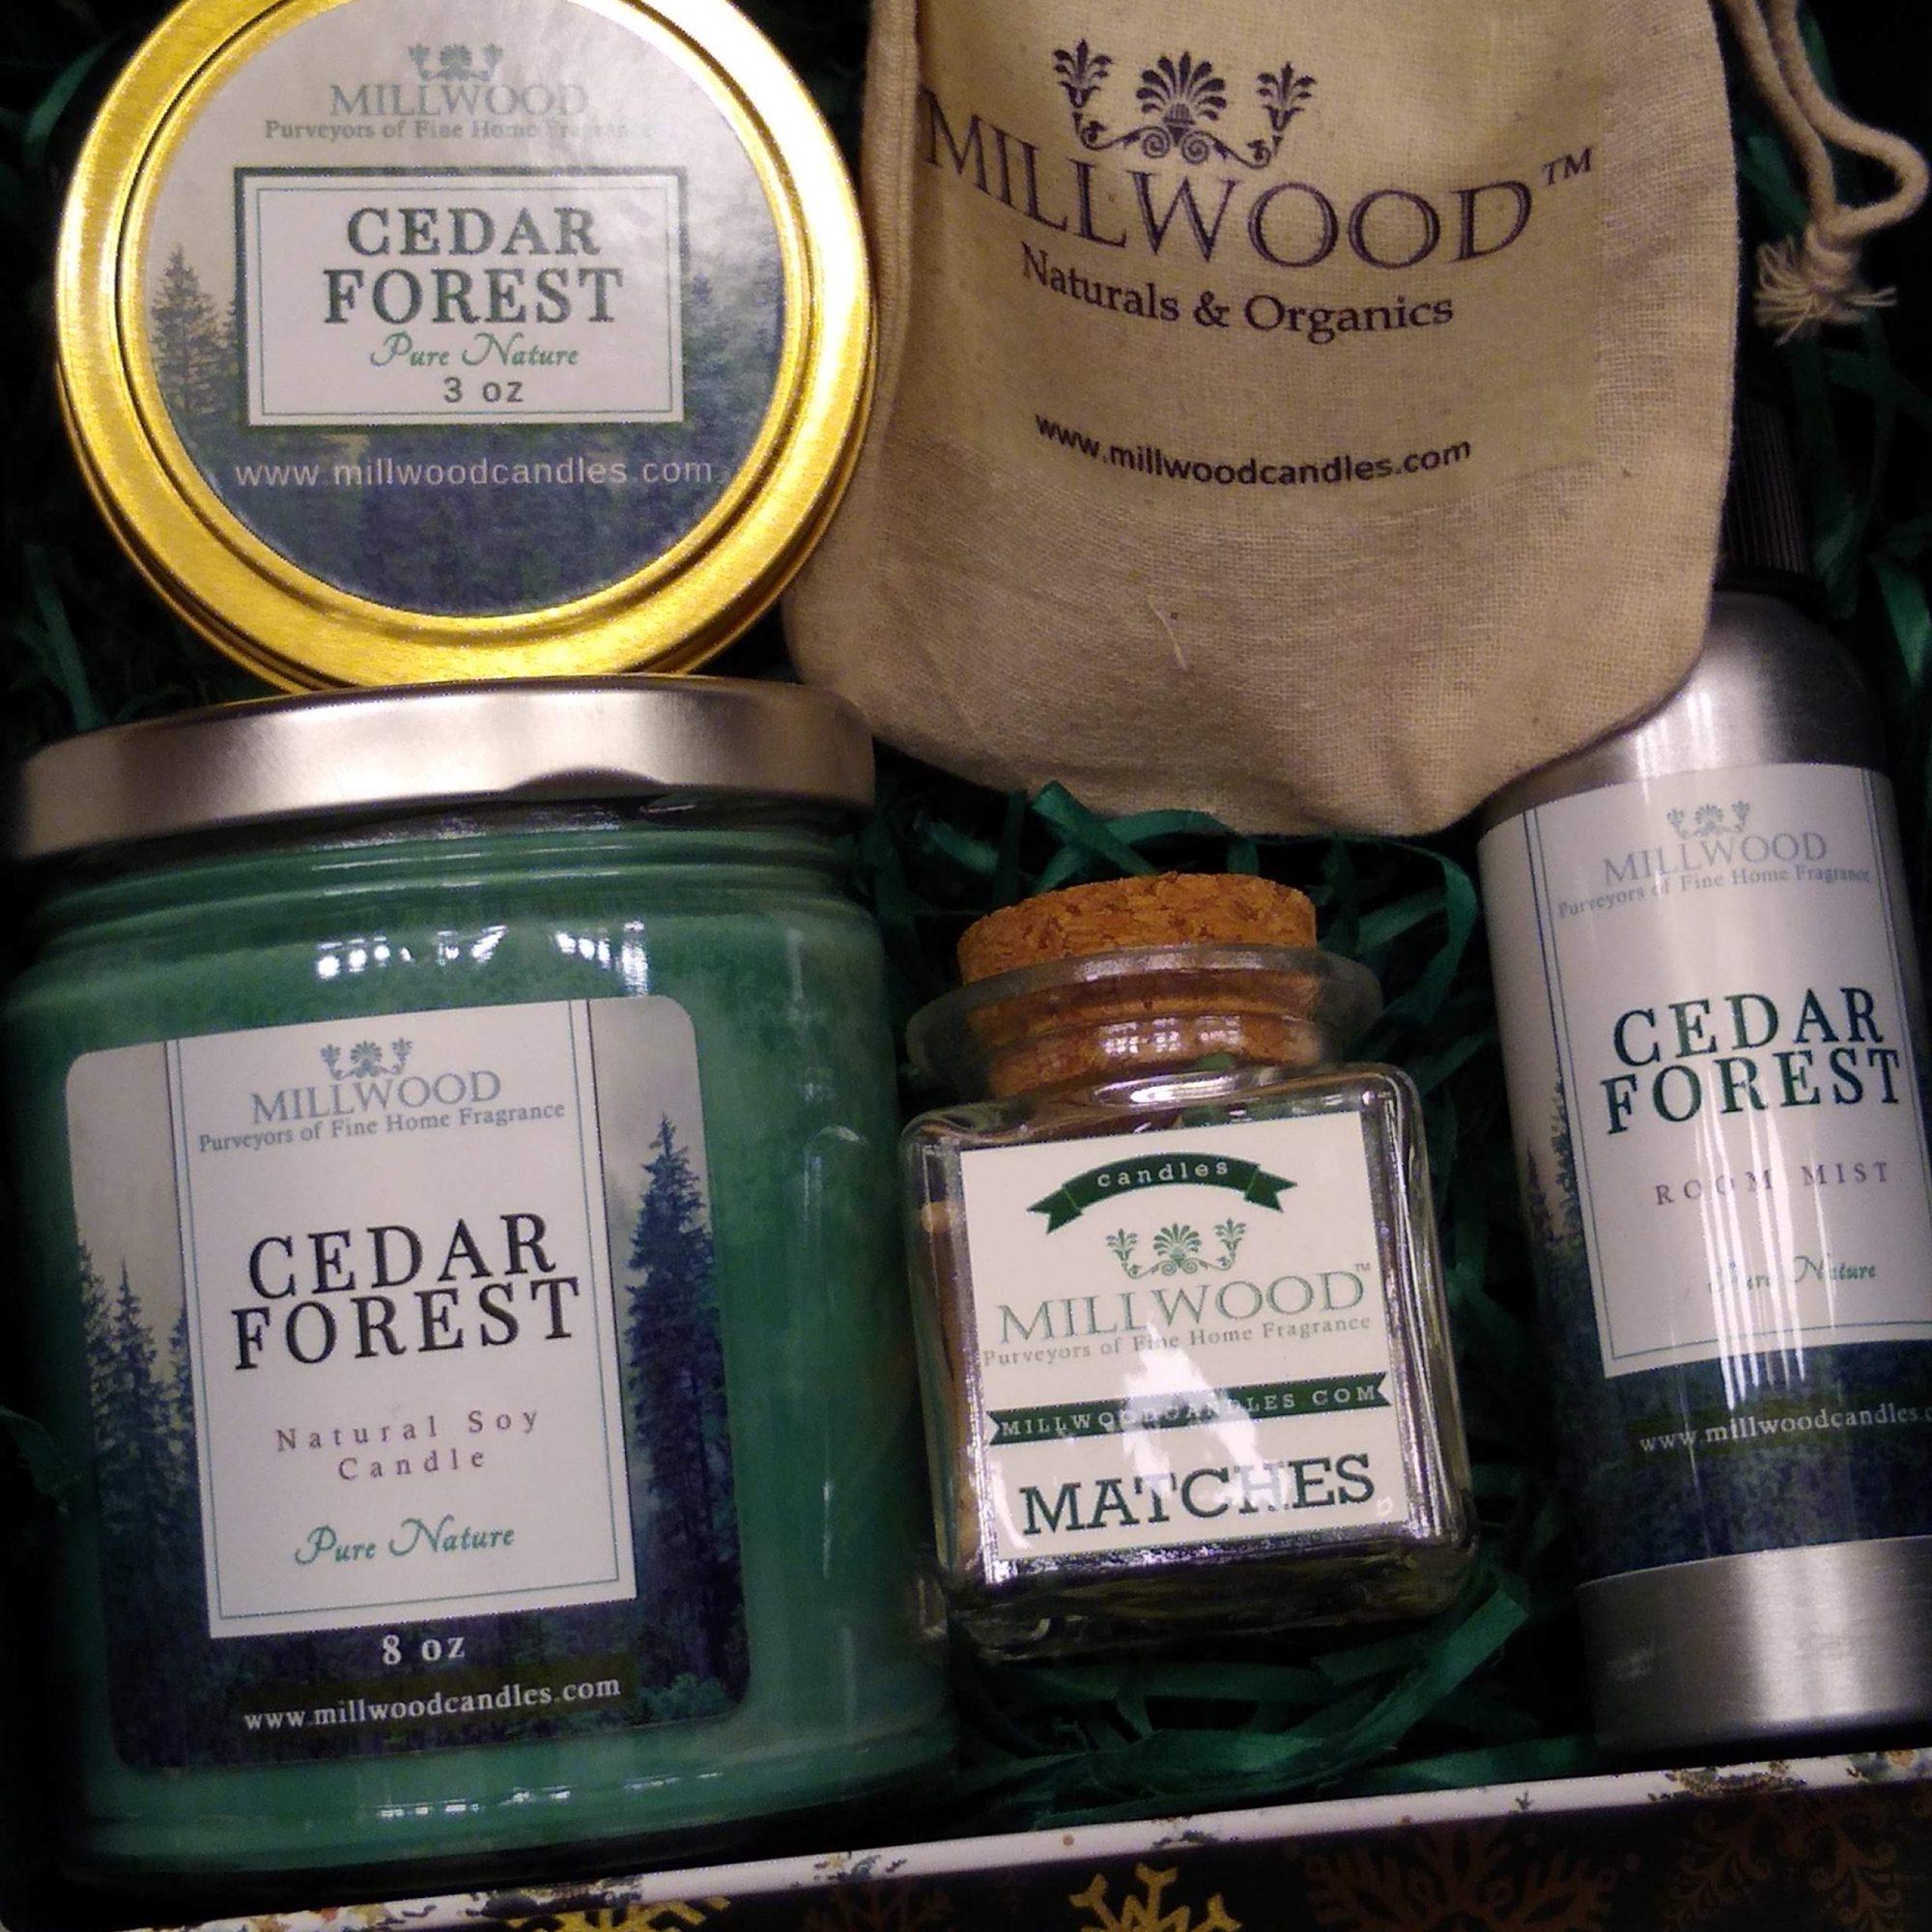 Cedar Christmas Box with Candles